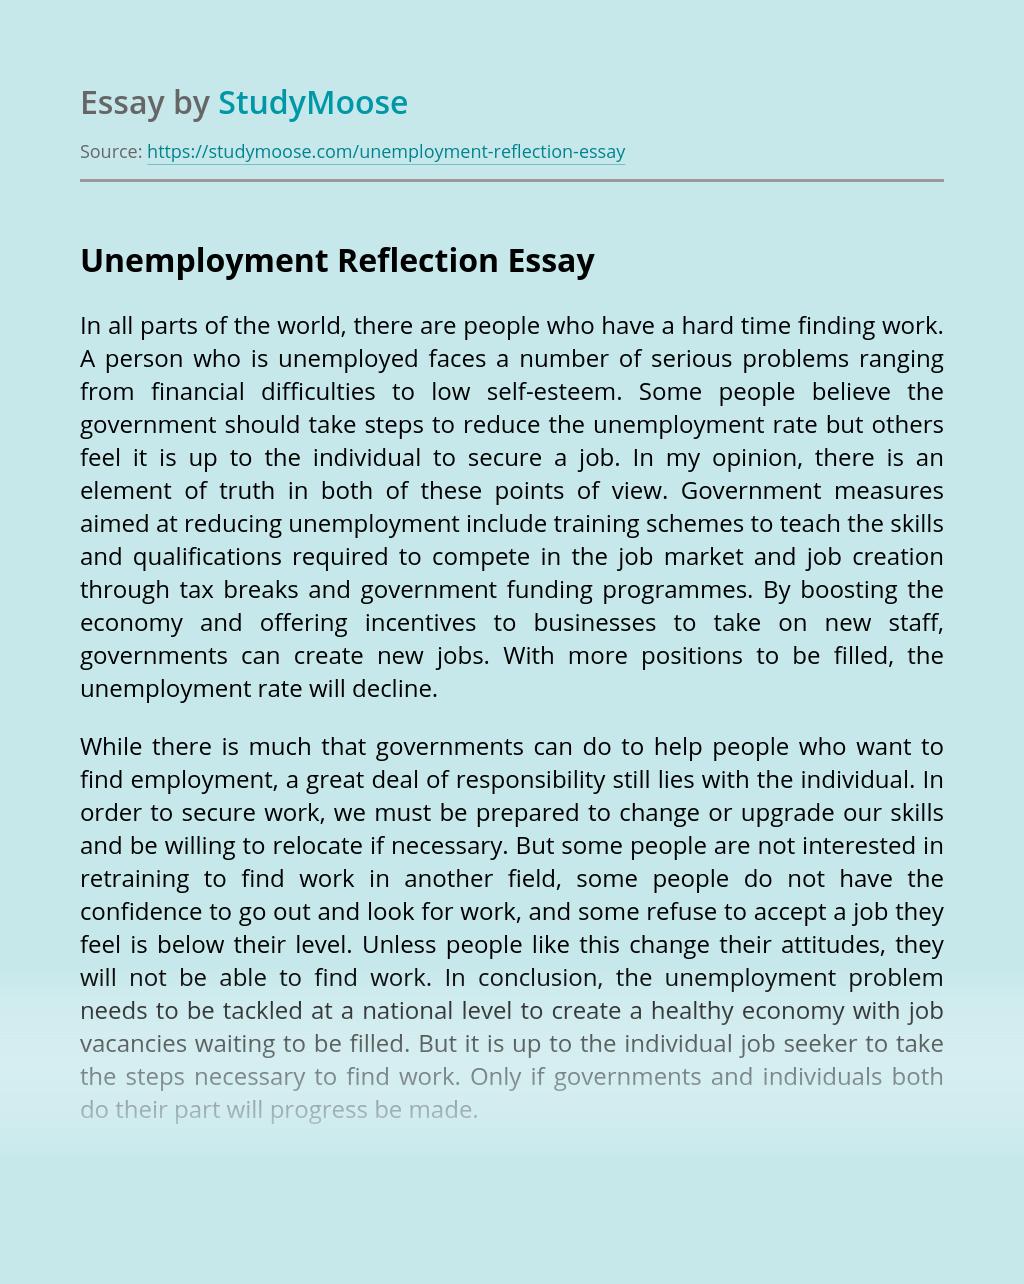 Unemployment Reflection